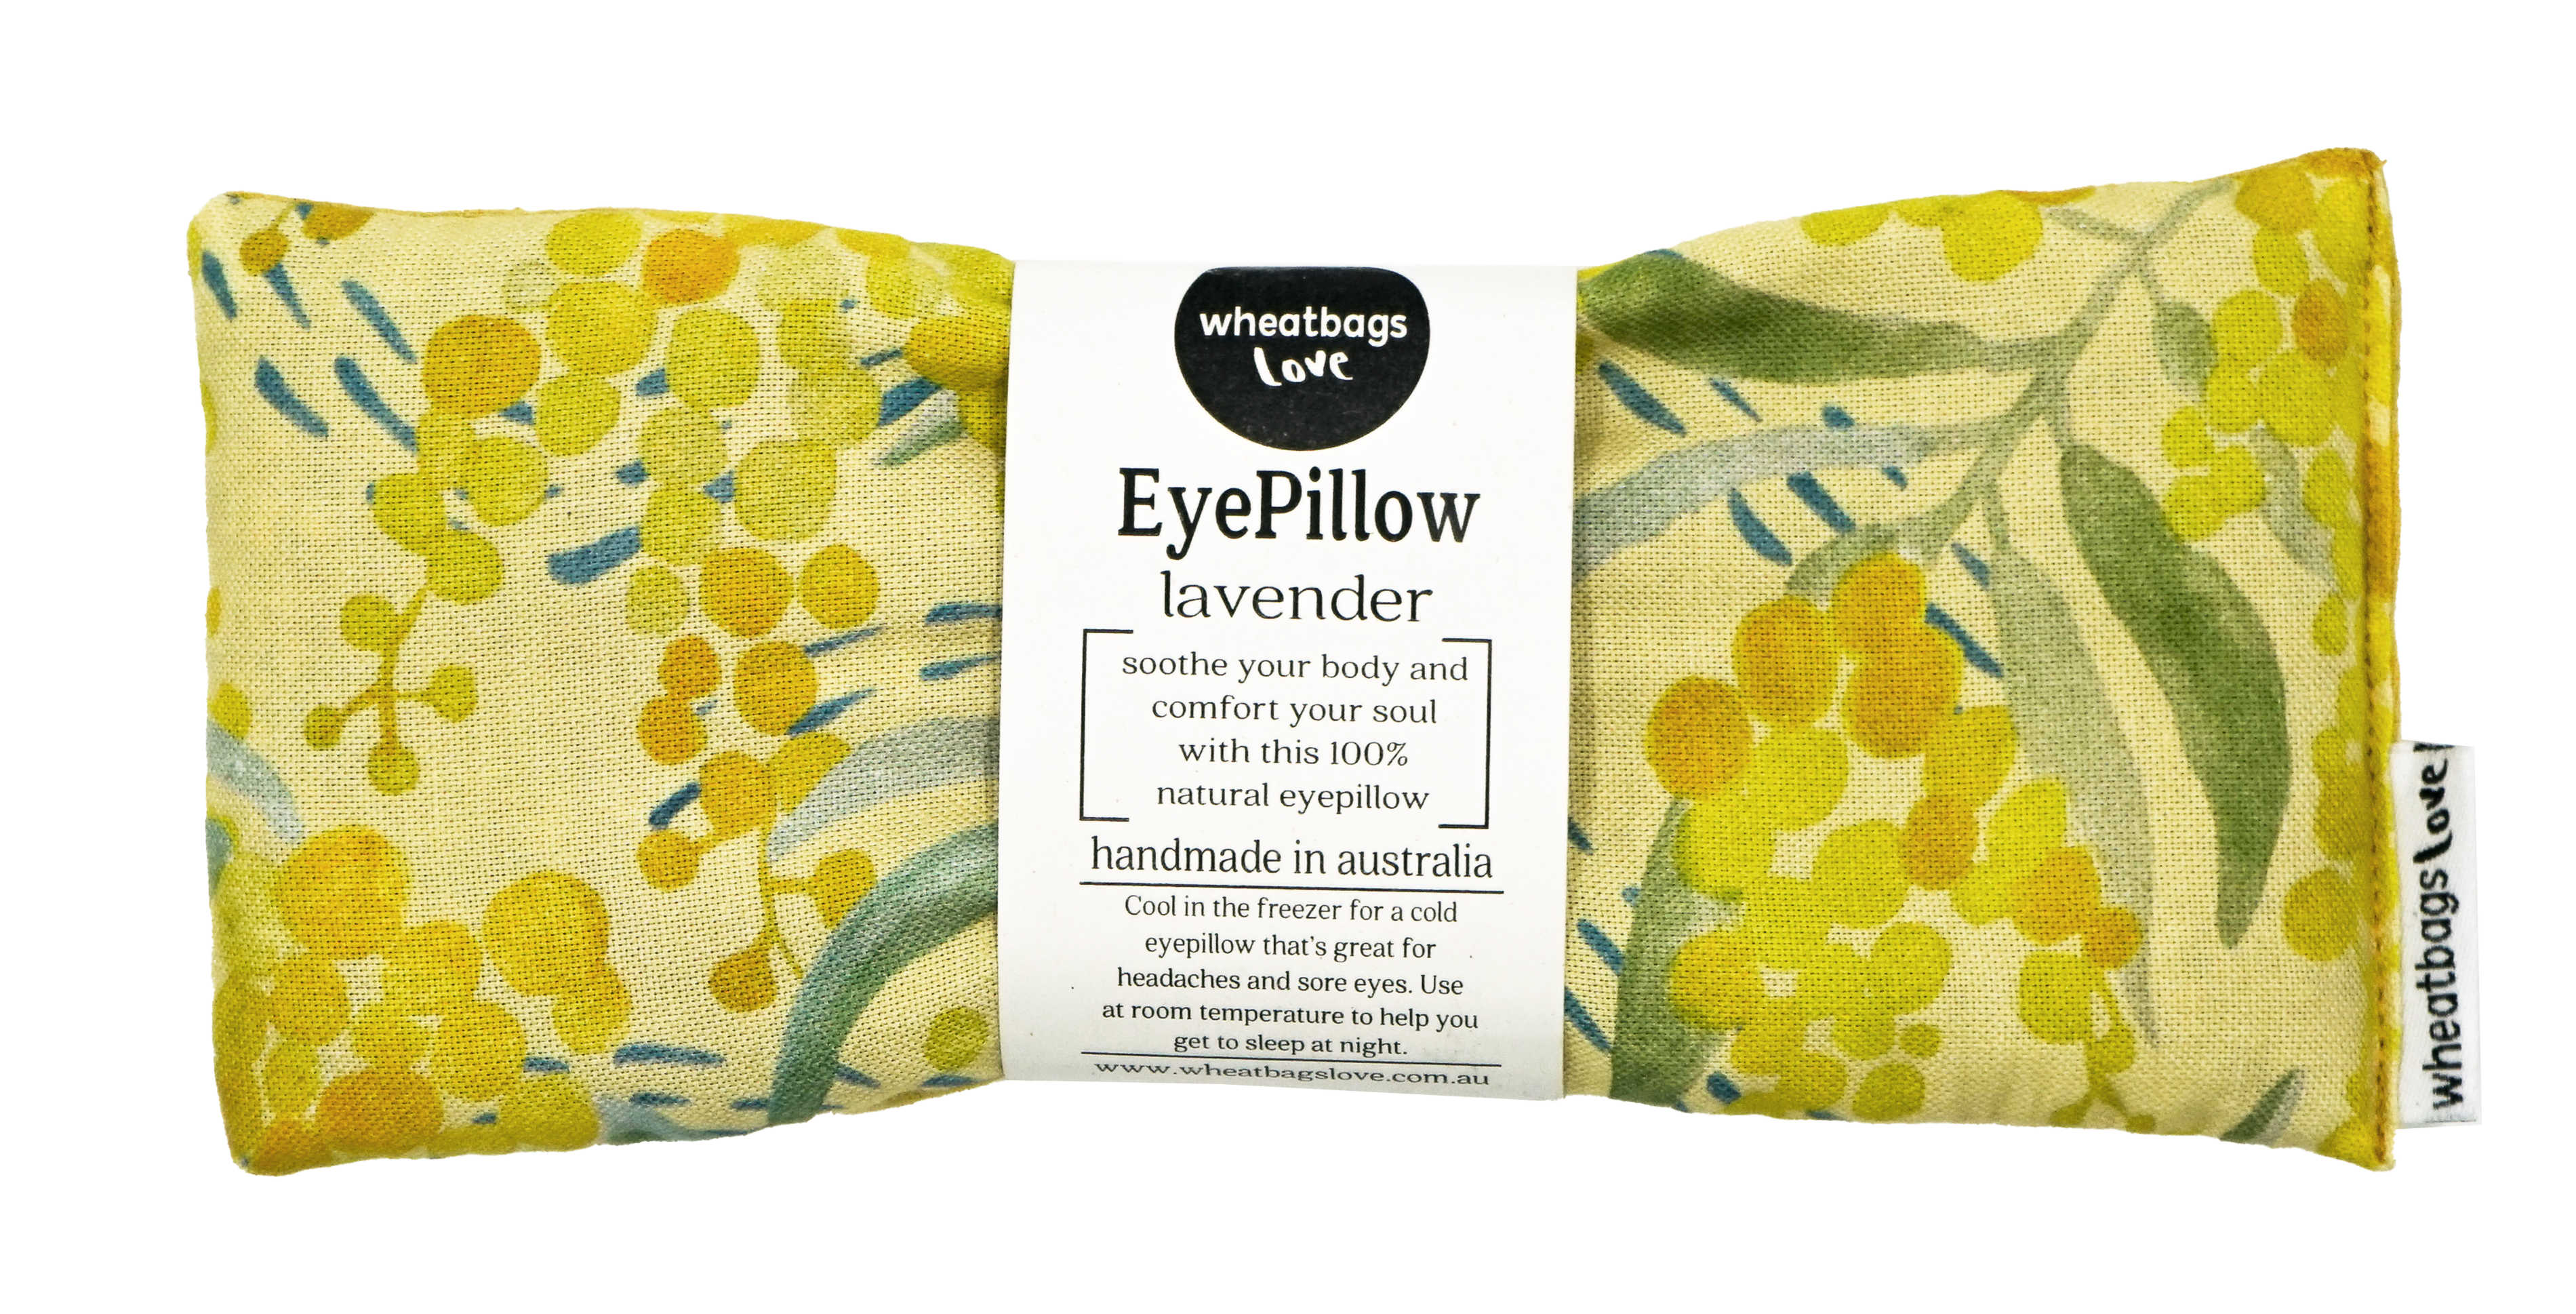 Wattle EyePillow